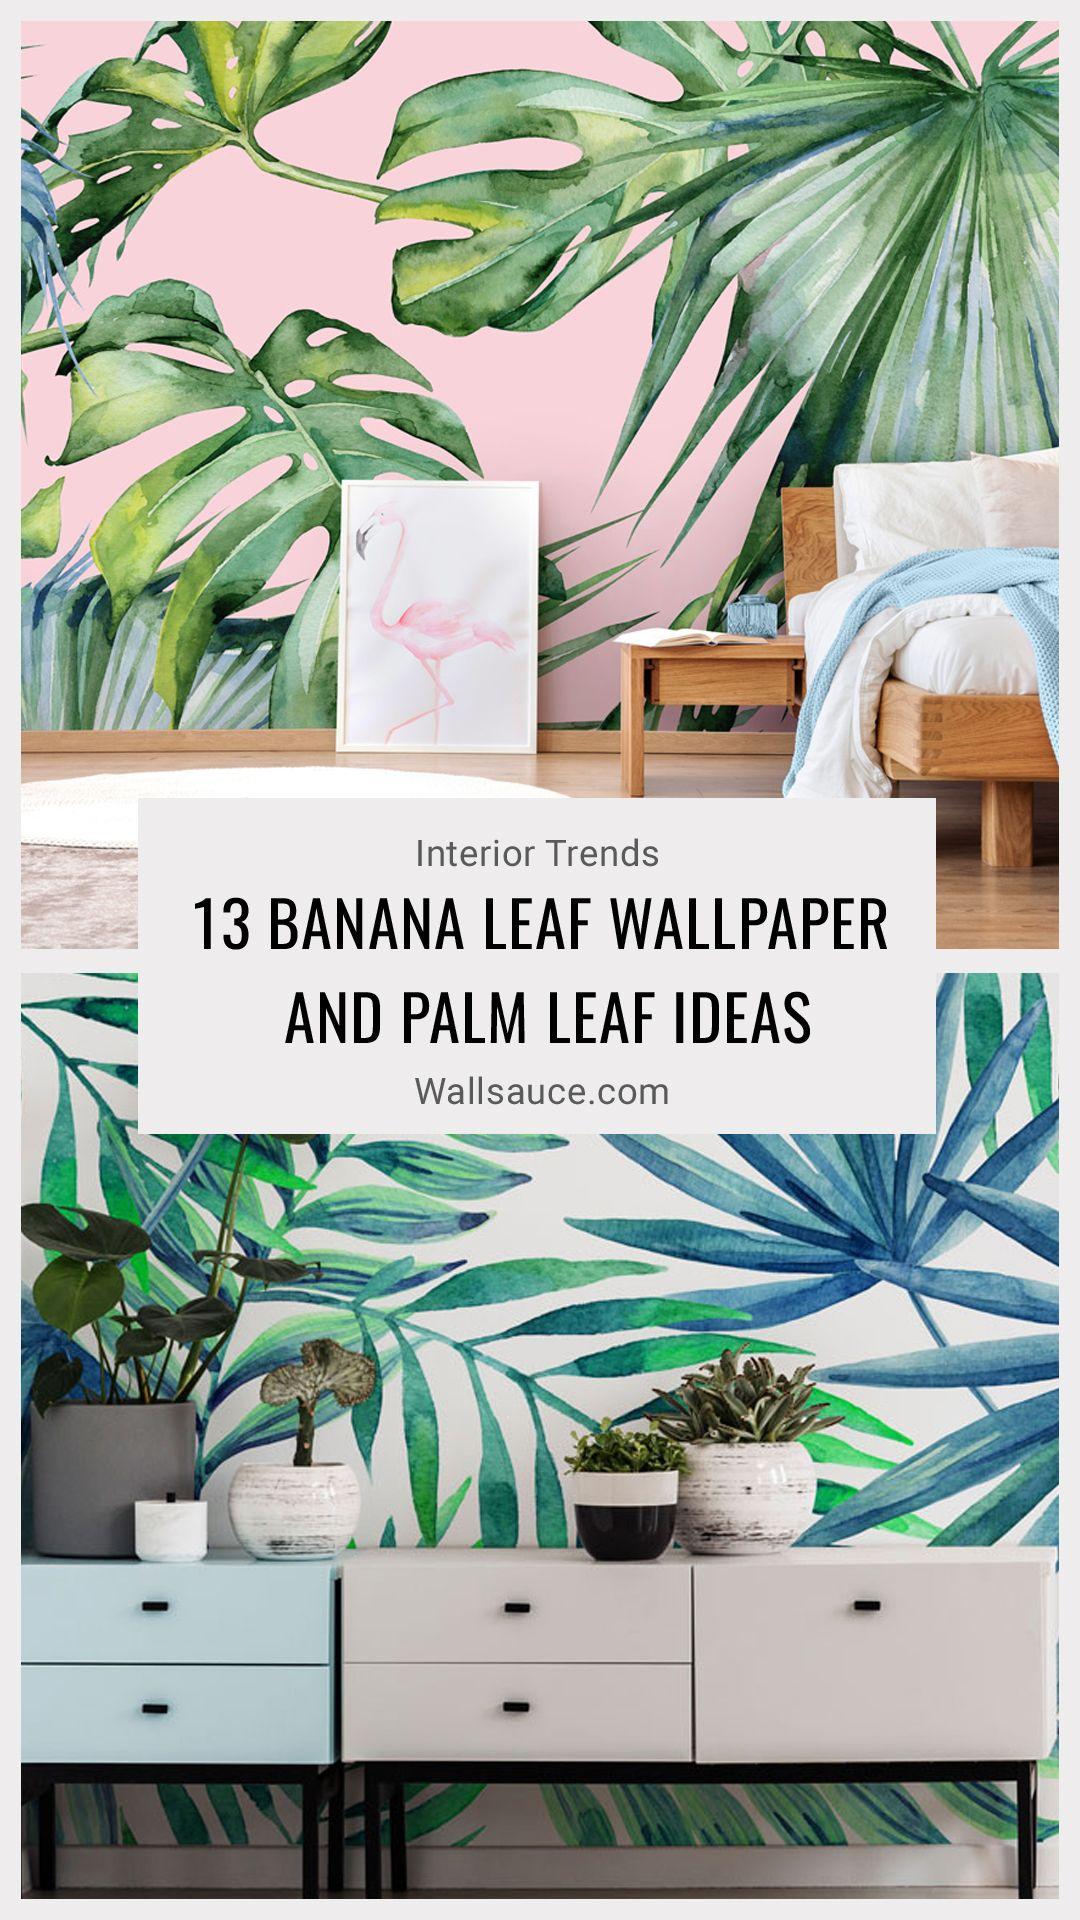 13 Banana Leaf Wallpaper and Palm Leaf Ideas Banana leaf